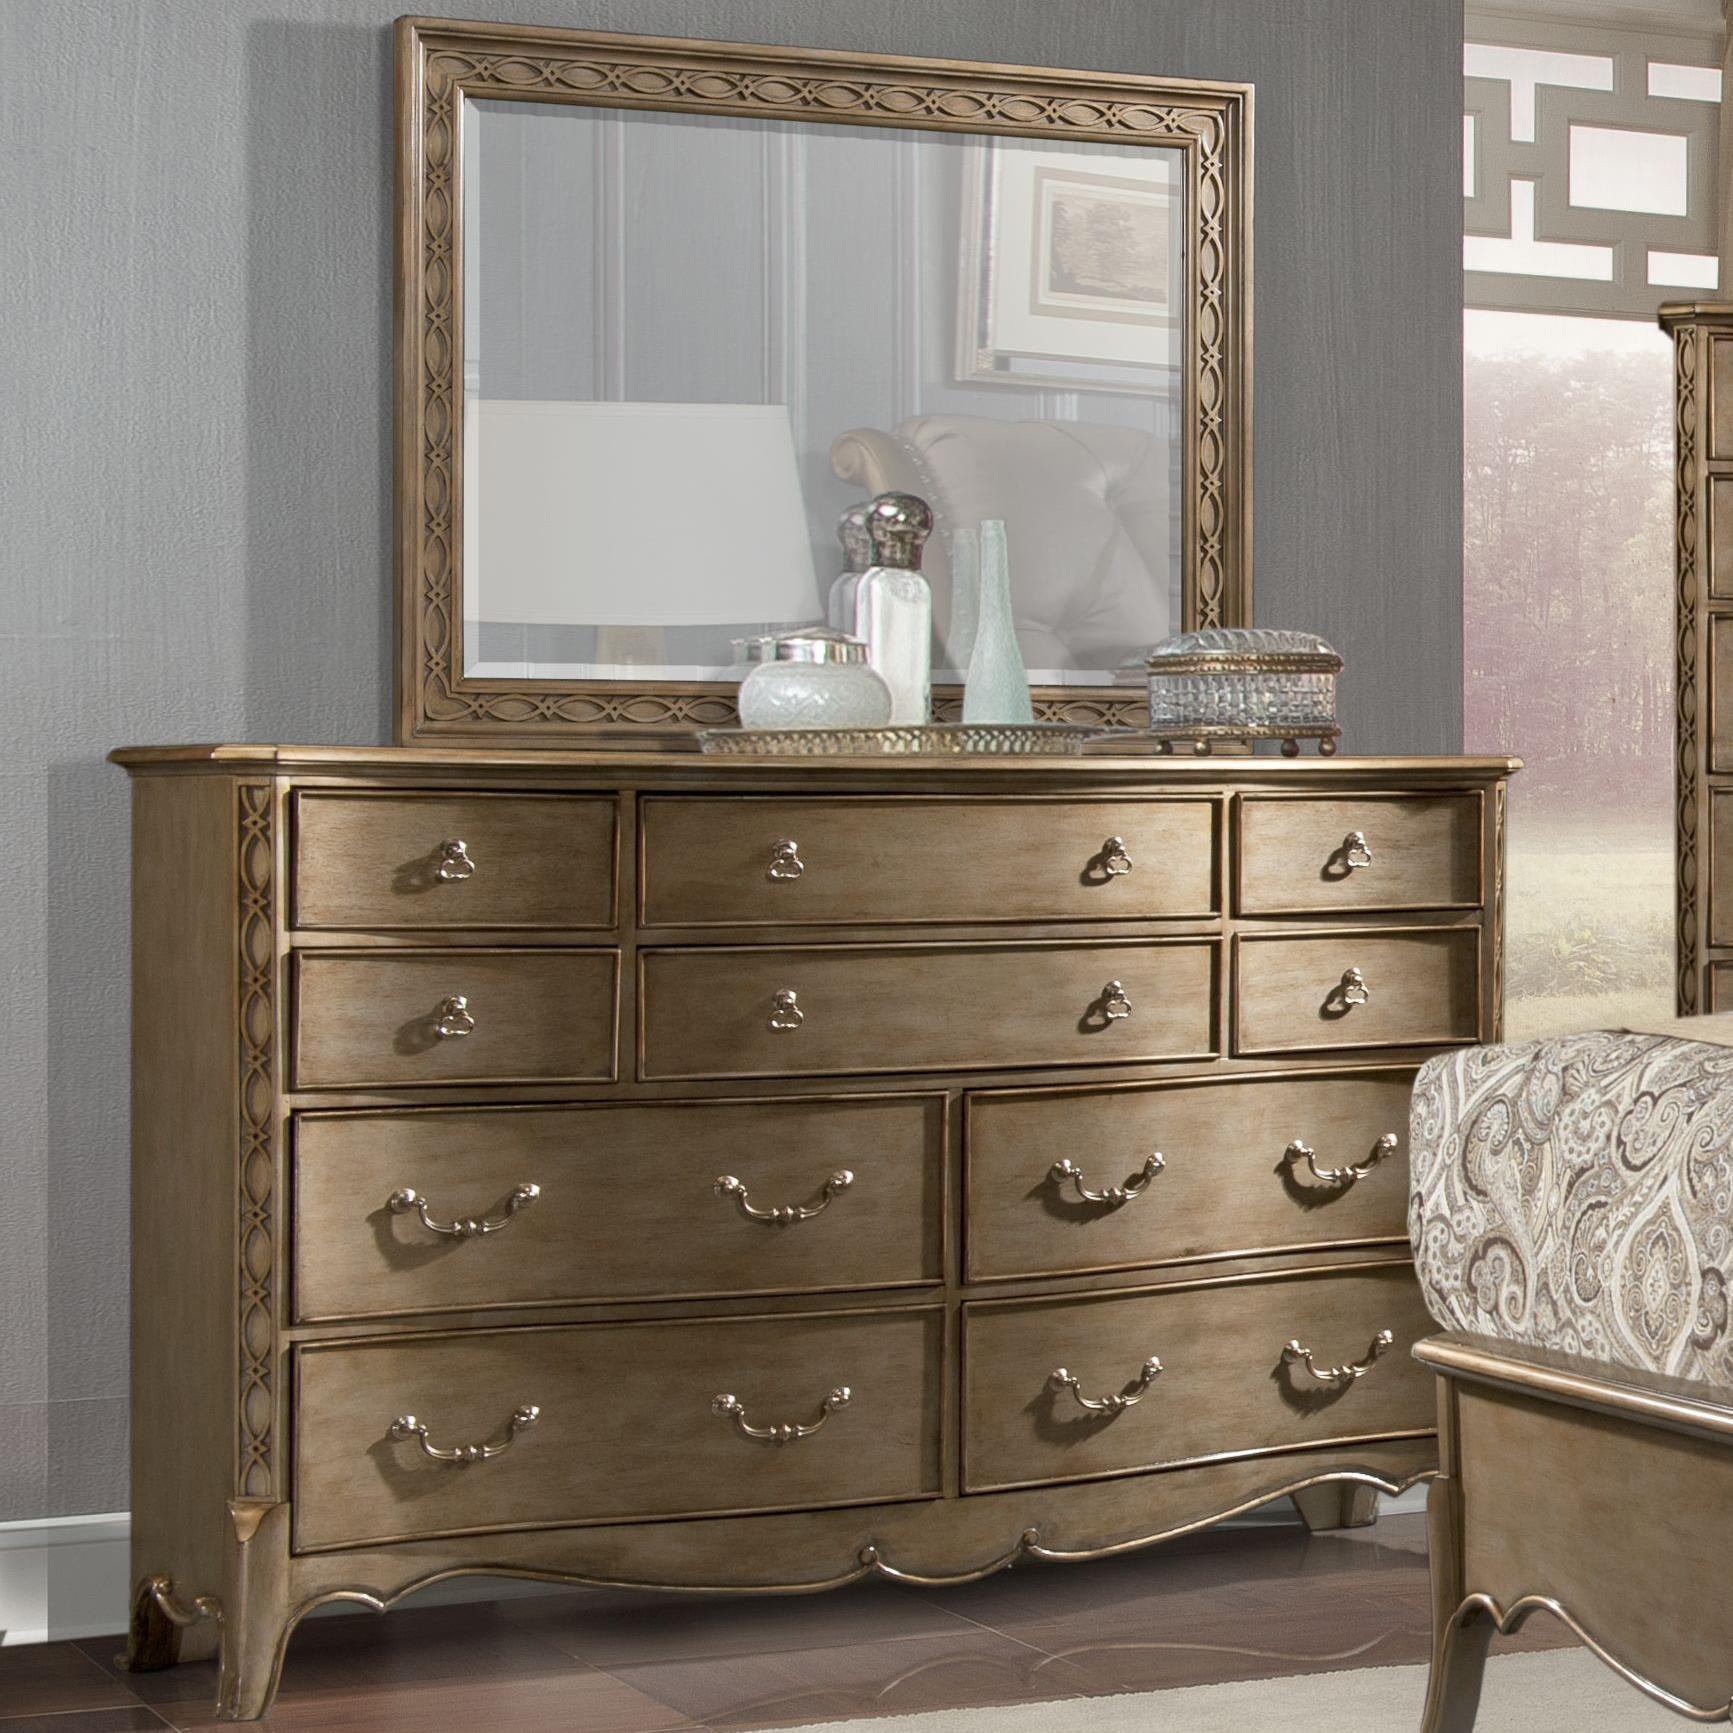 Homelegance Chambord Dresser and Mirror Set - Item Number: 1828-5+6LN